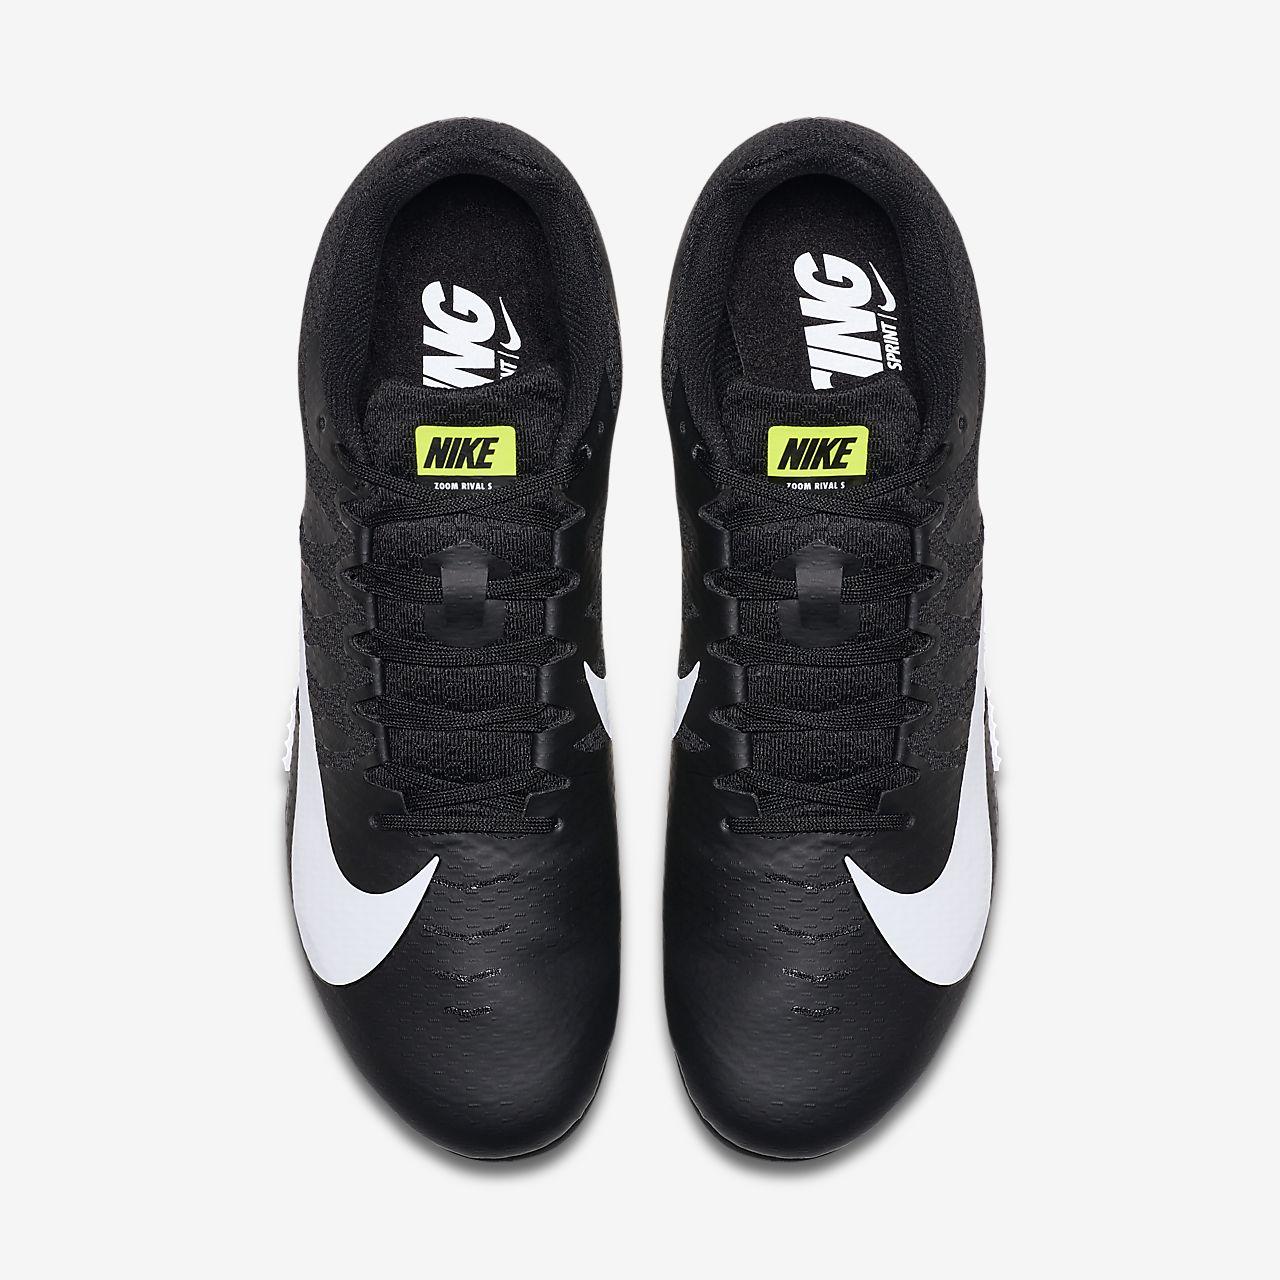 Zoom Con Unisex Nike S Zapatillas Clavos 9 Rival QotdBshrCx